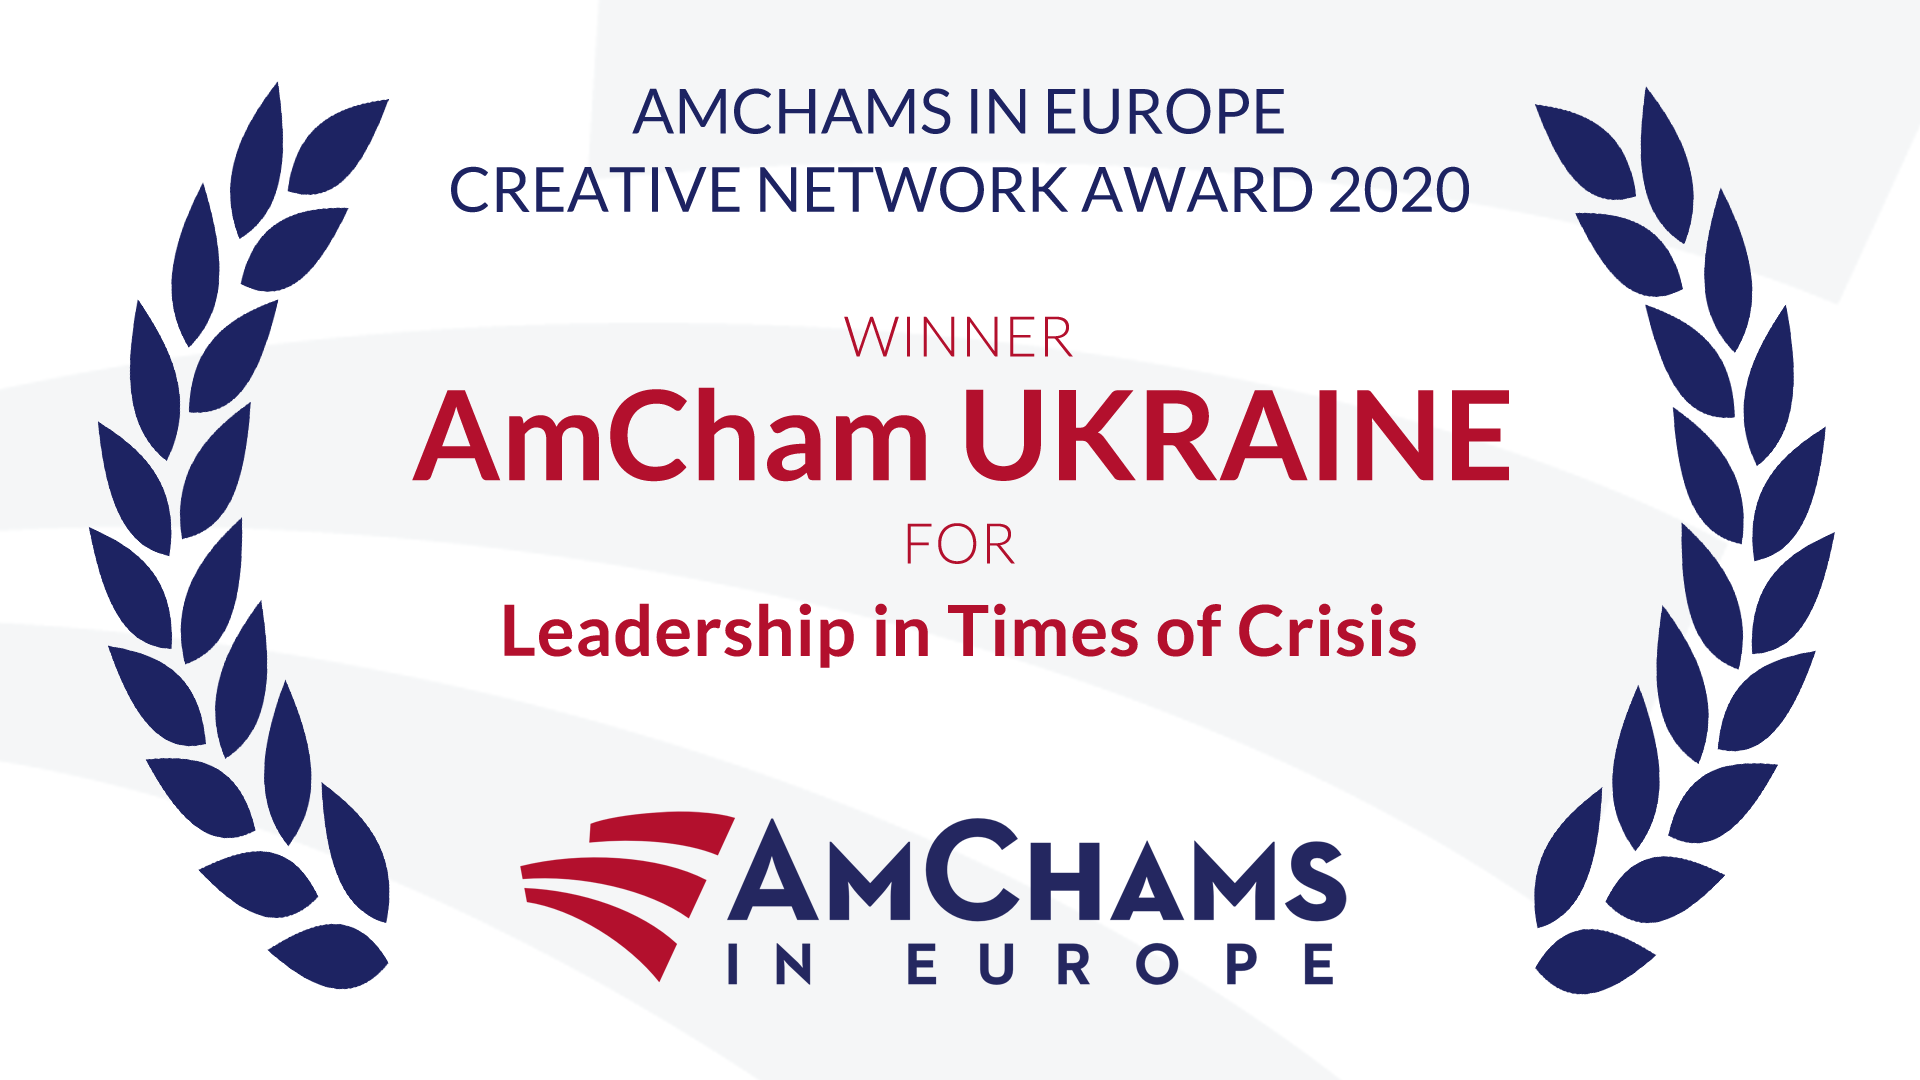 AmCham Ukraine Wins European Creative Network Award 2020